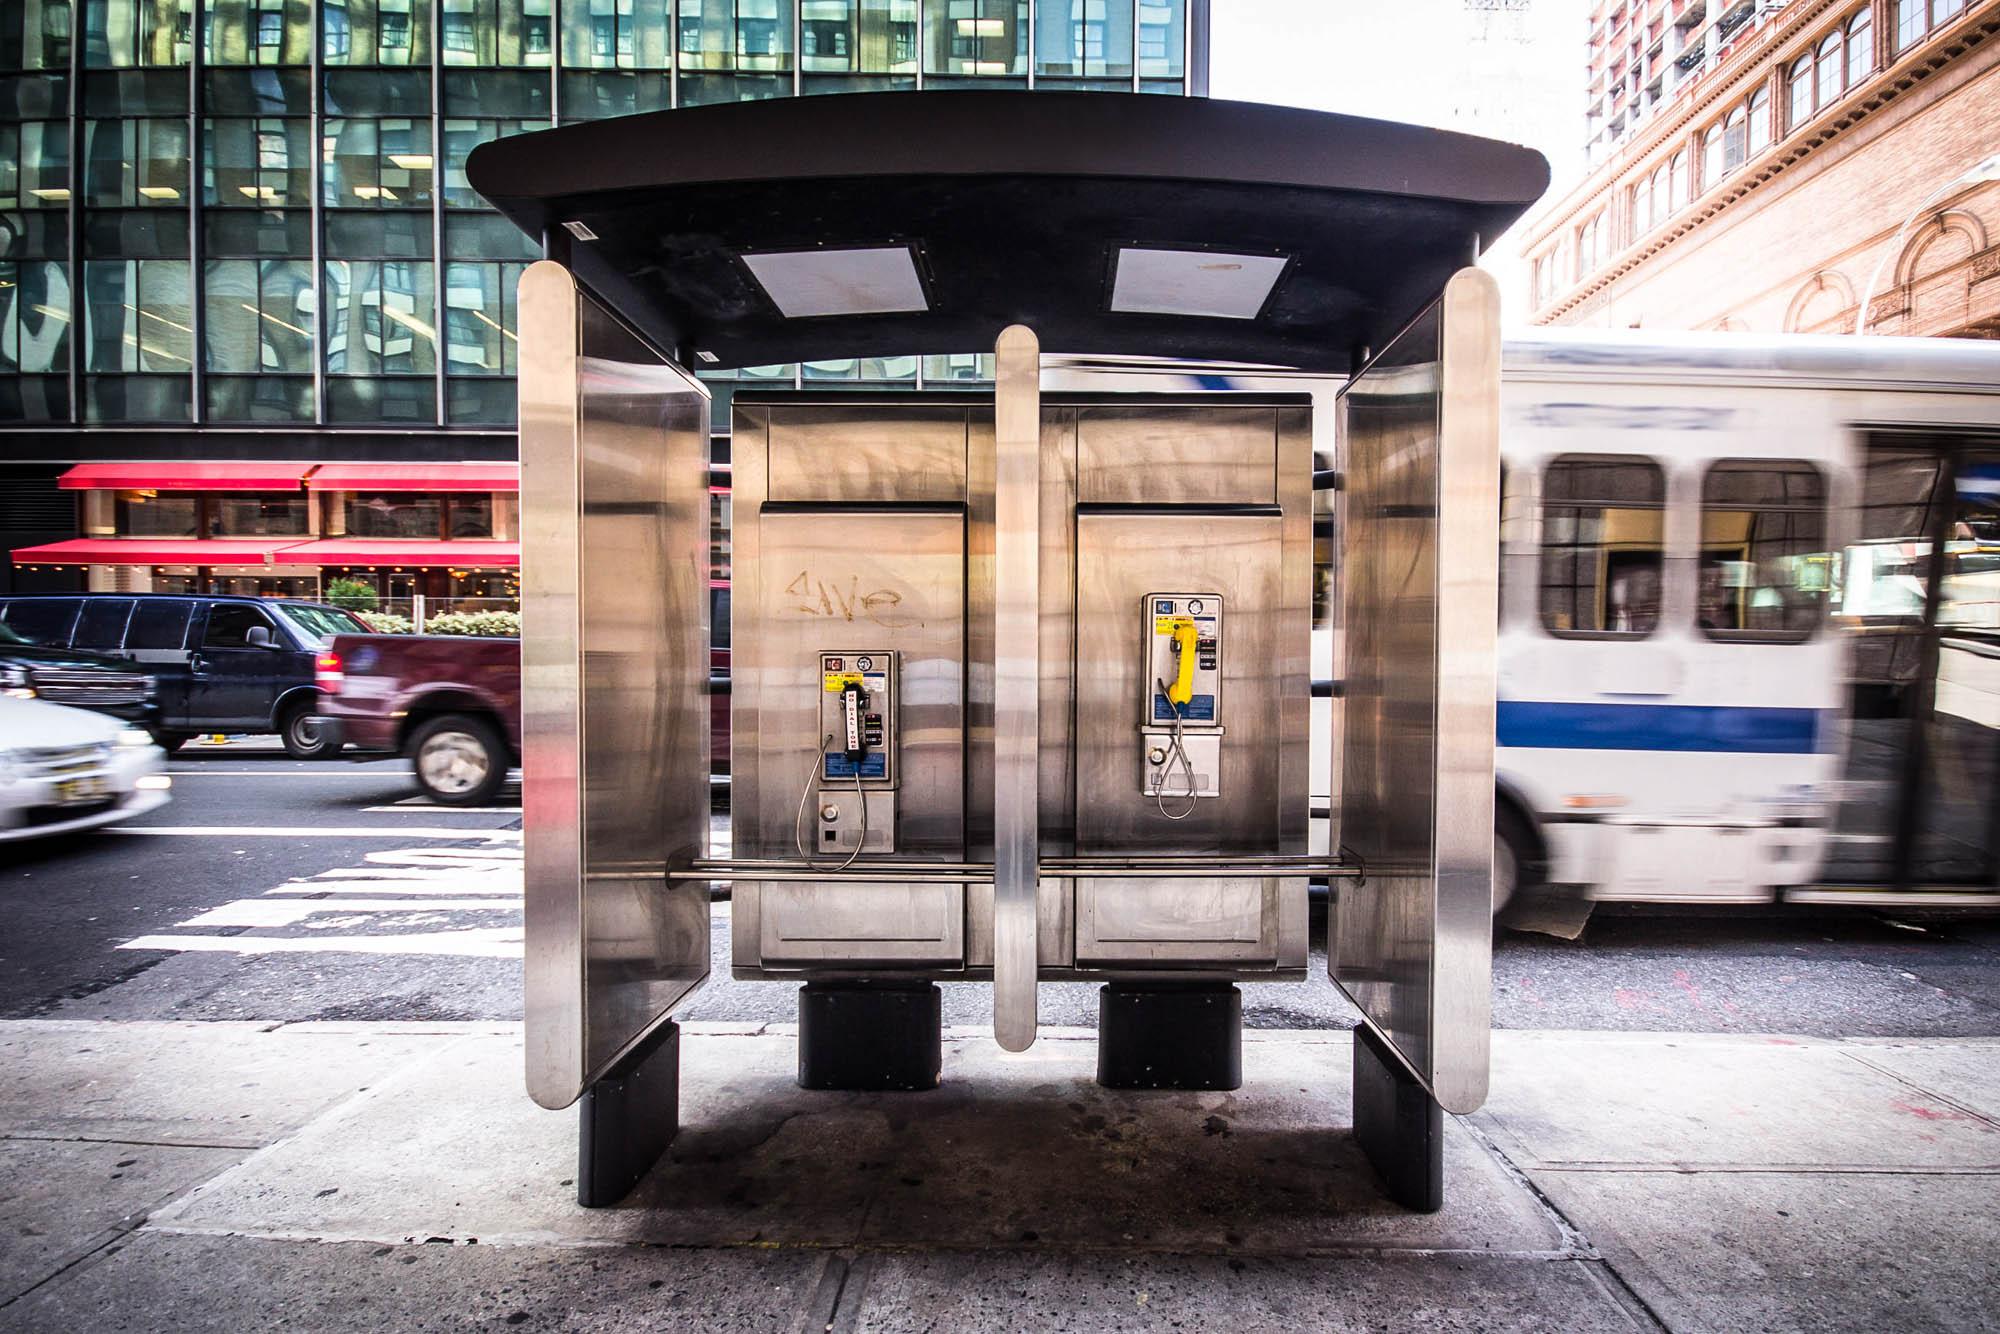 Pay phones on city sidewalk (Shutterstock)